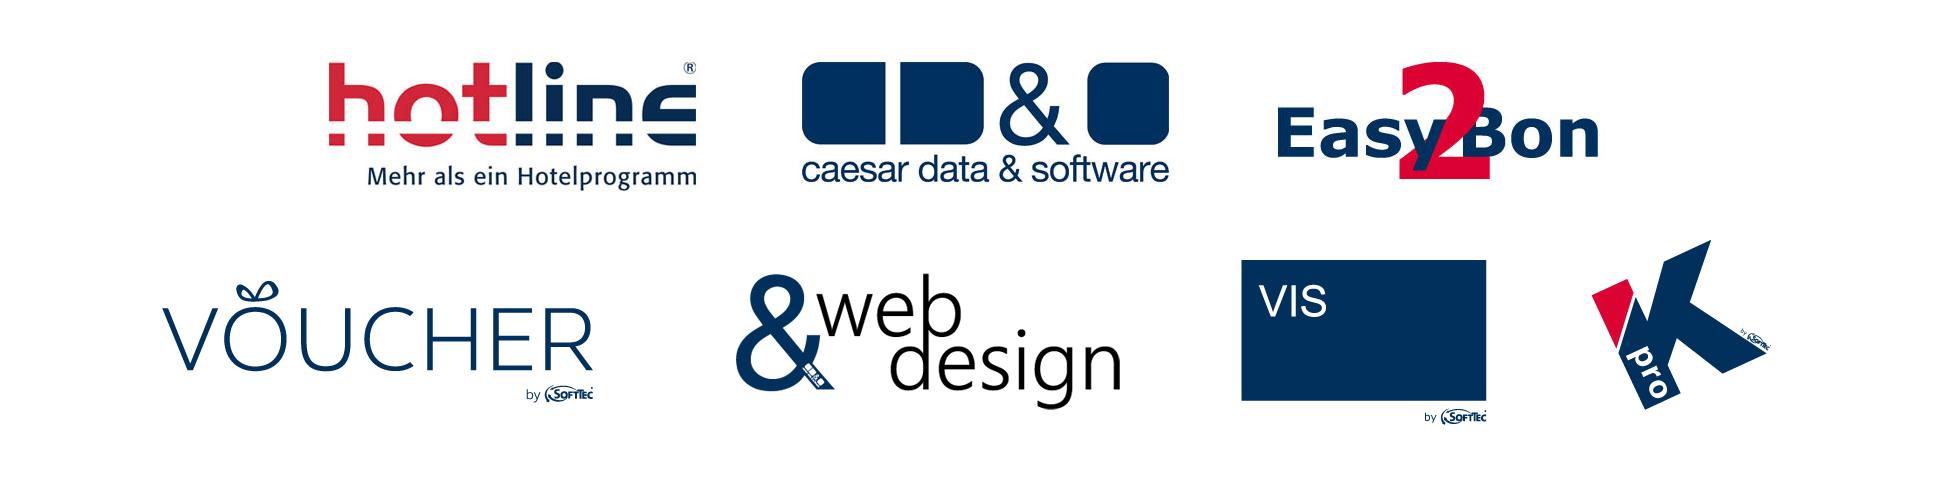 hotline caesar data & software Easy2Bon VOUCHER web&design EASY2RES Kpro VIS SoftTec GmbH